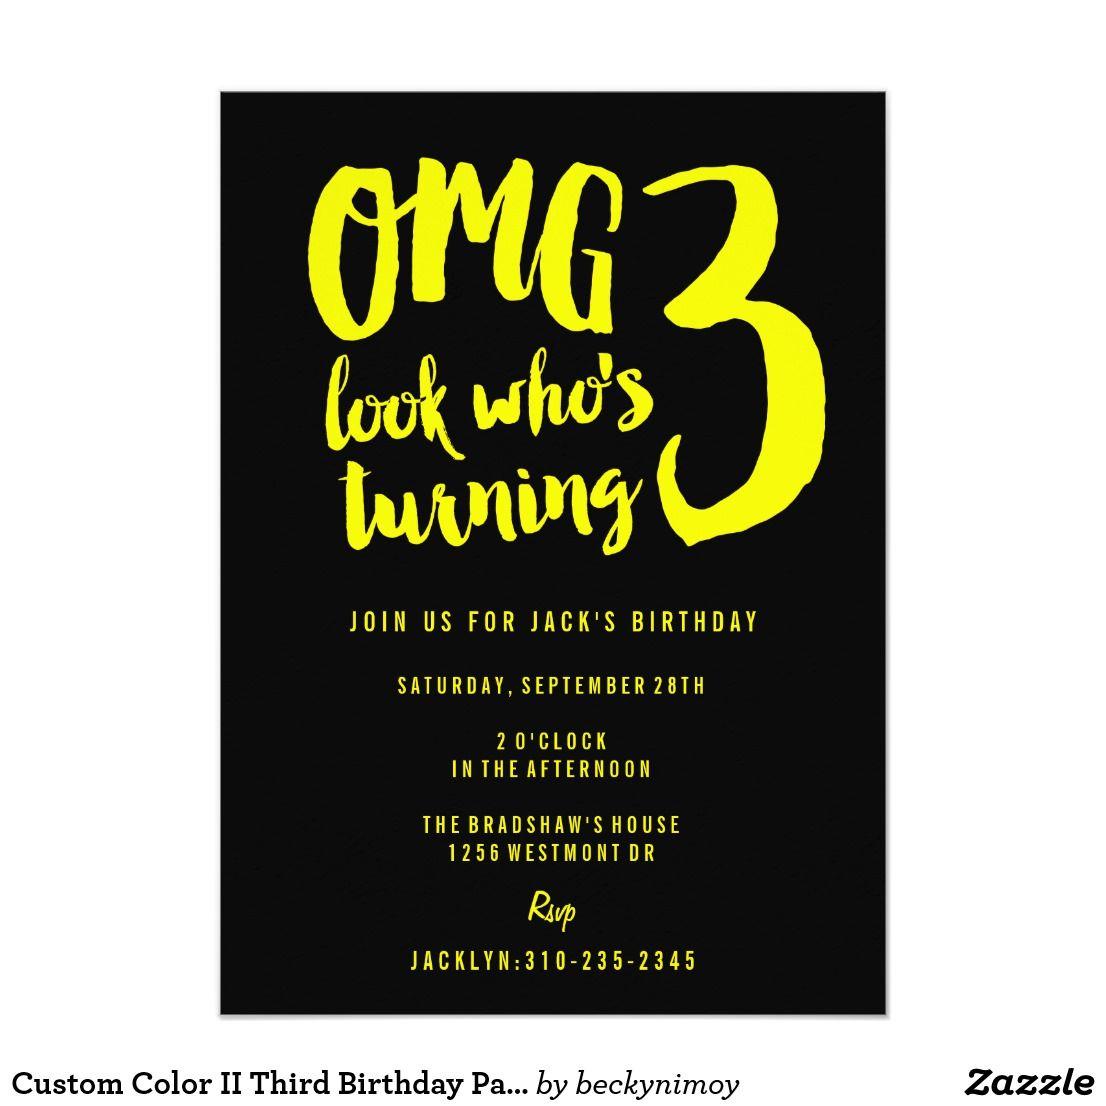 custom color ii third birthday party